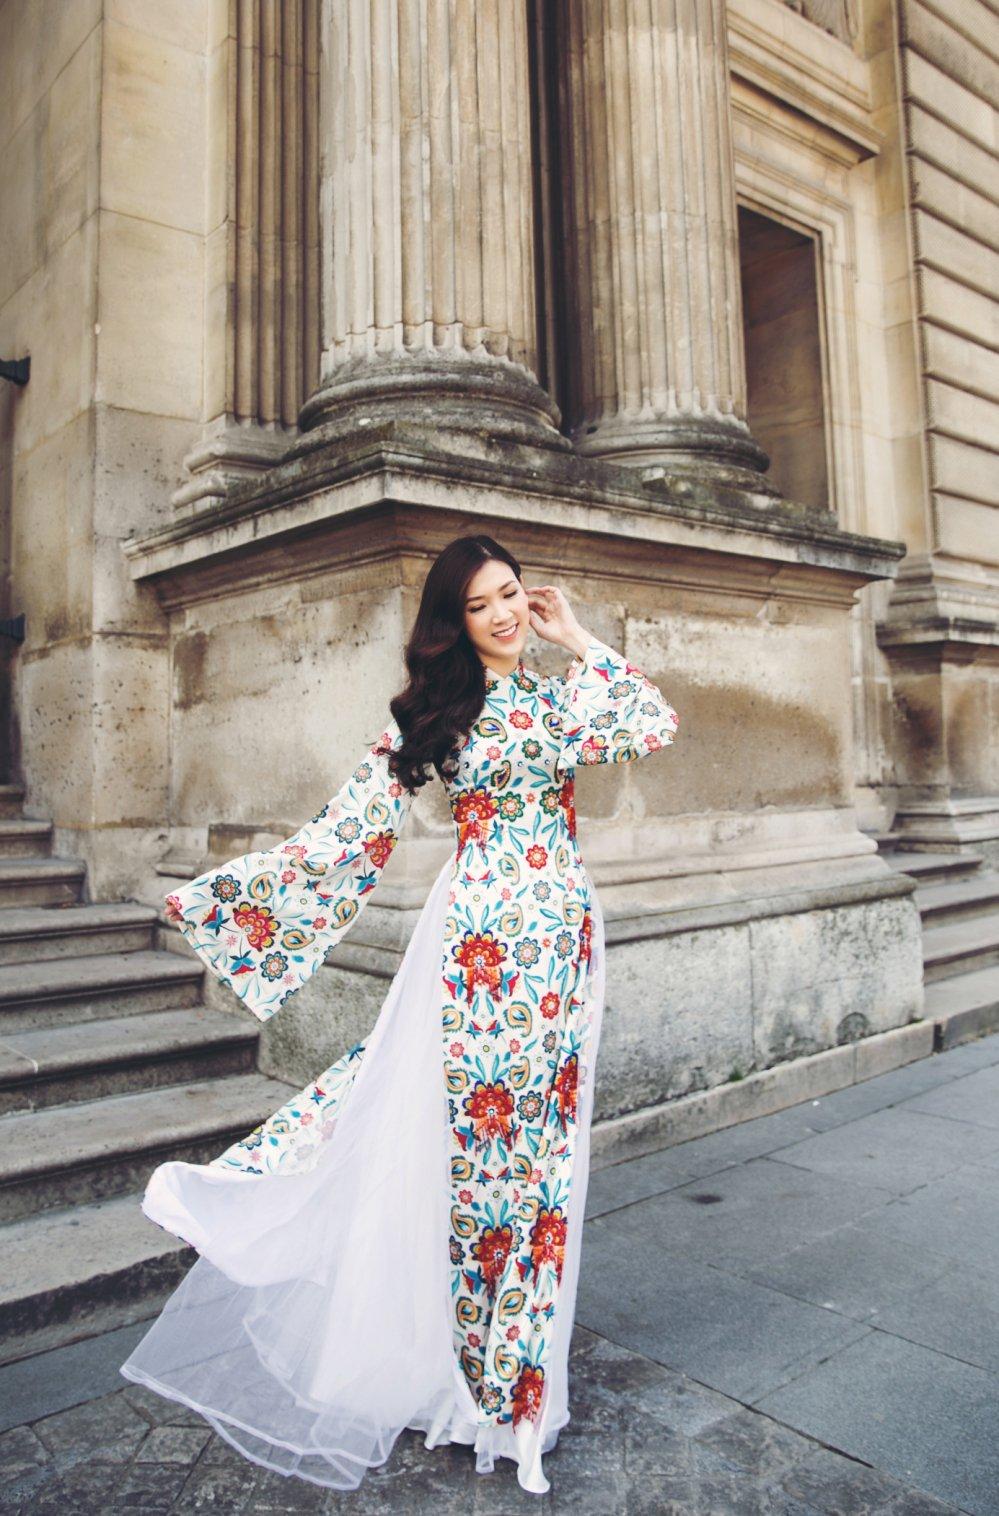 Hoa hau Ao dai 2018 Phi Thuy Linh khoe ong xa doanh nhan dien trai hinh anh 10